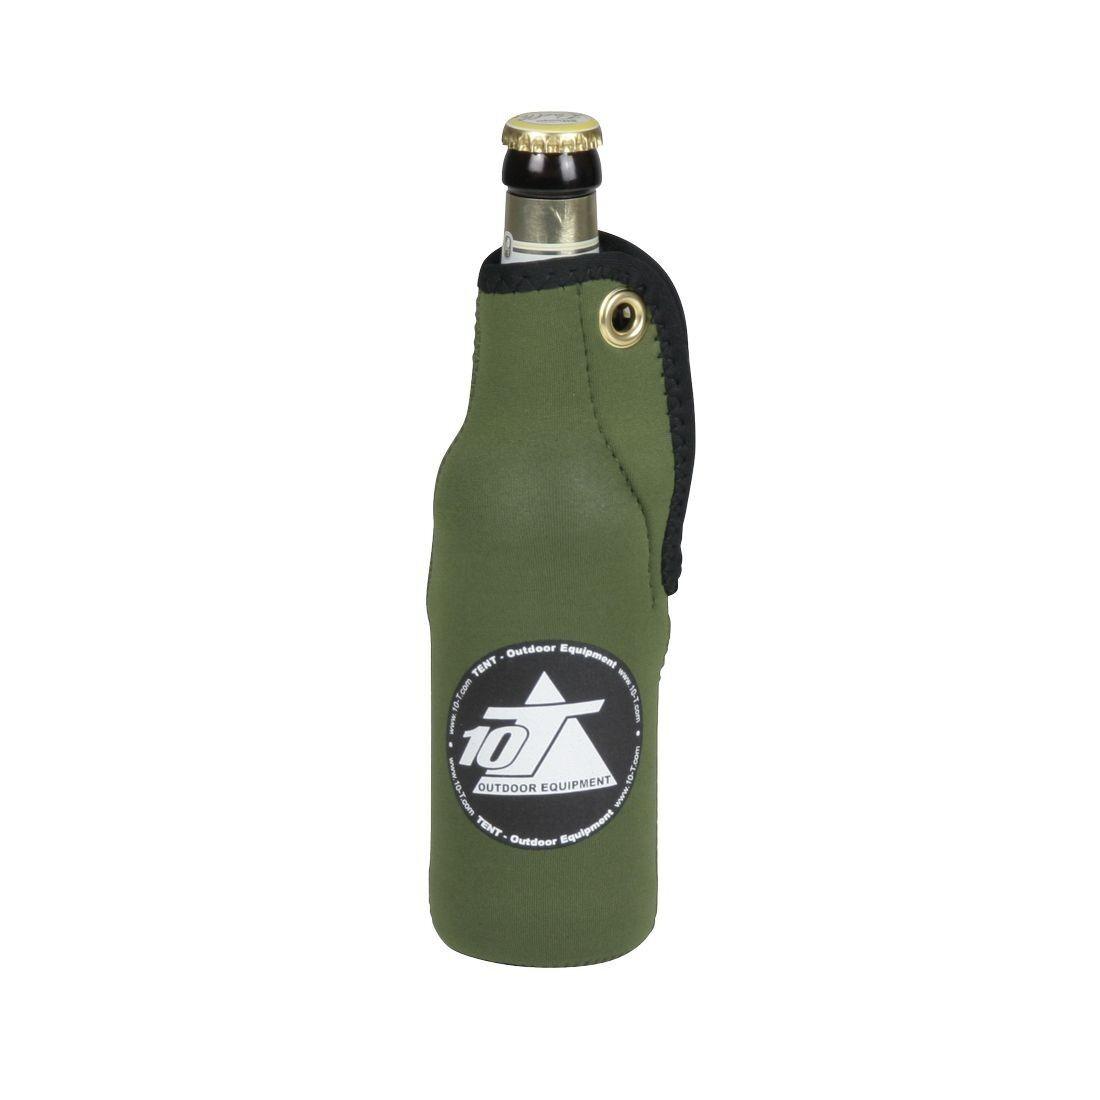 10t Cooler 350 Ml Dosenkühler Flaschenkühler Neopren Kühler Getränkekühler